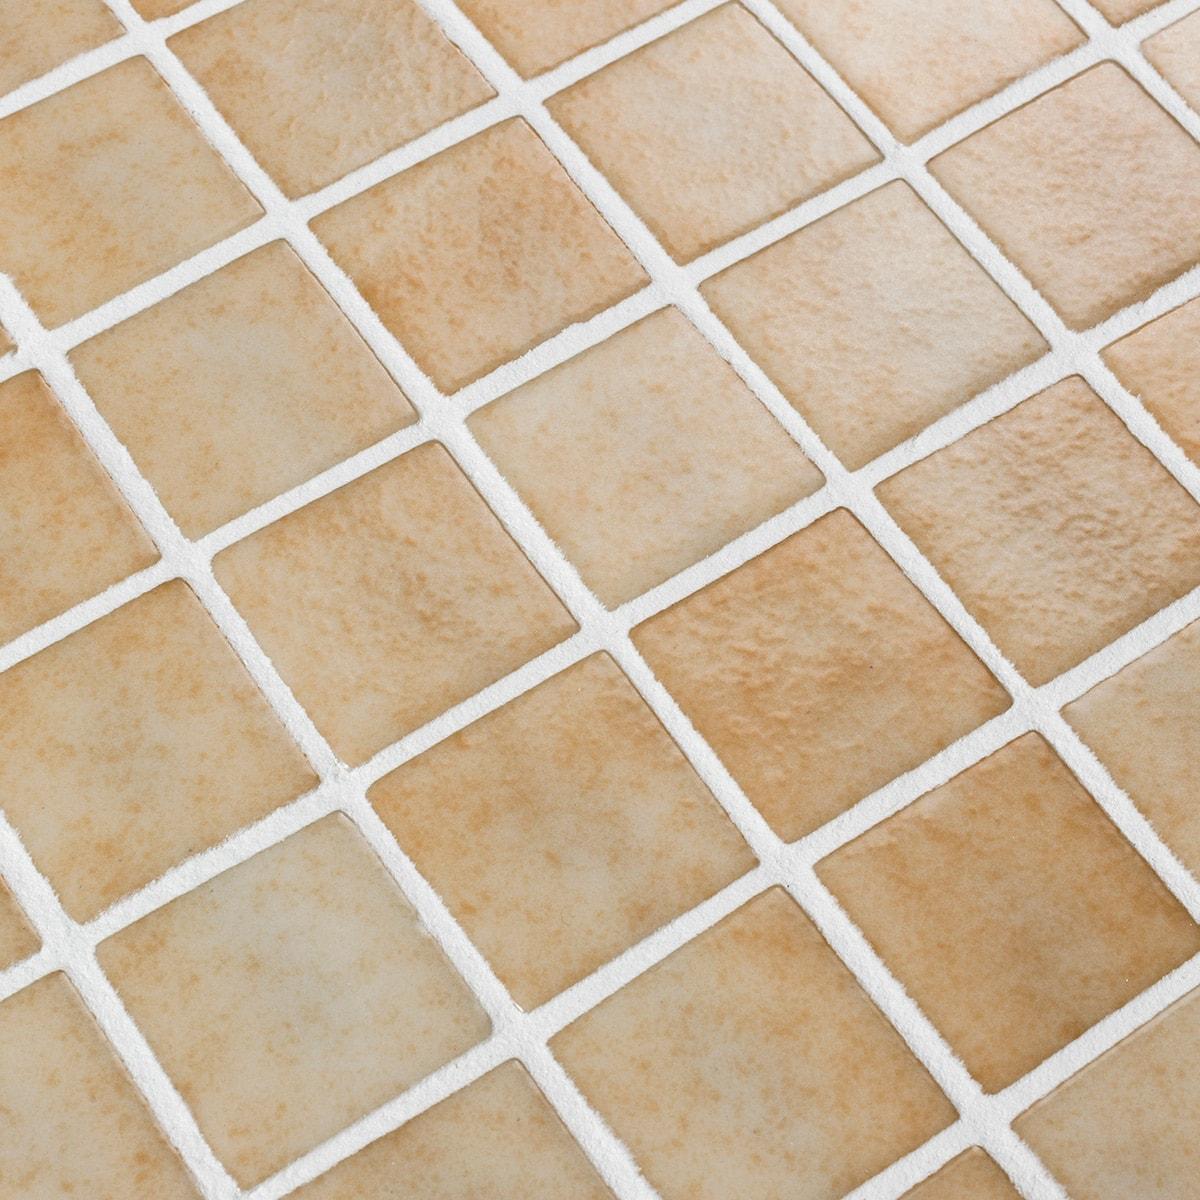 5096-B-Safe-Safe-steps-Mosaic-Ezarri.jpg